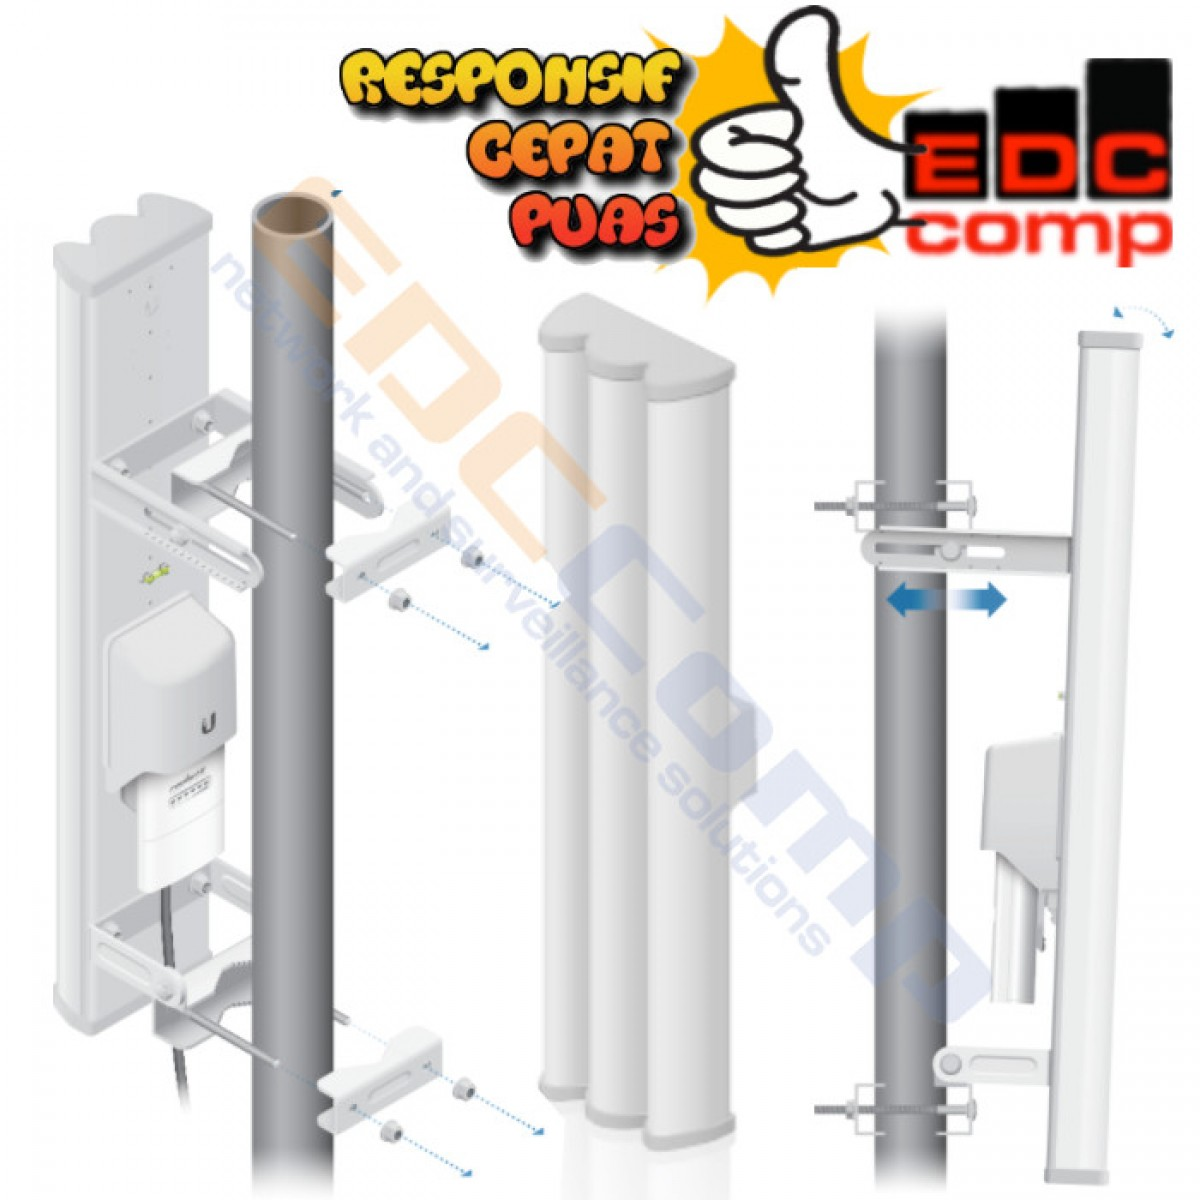 Ubiquiti Antena Airmax Sectoral 5G 19dBi 120Degree / AM5G19-120 - EdcComp